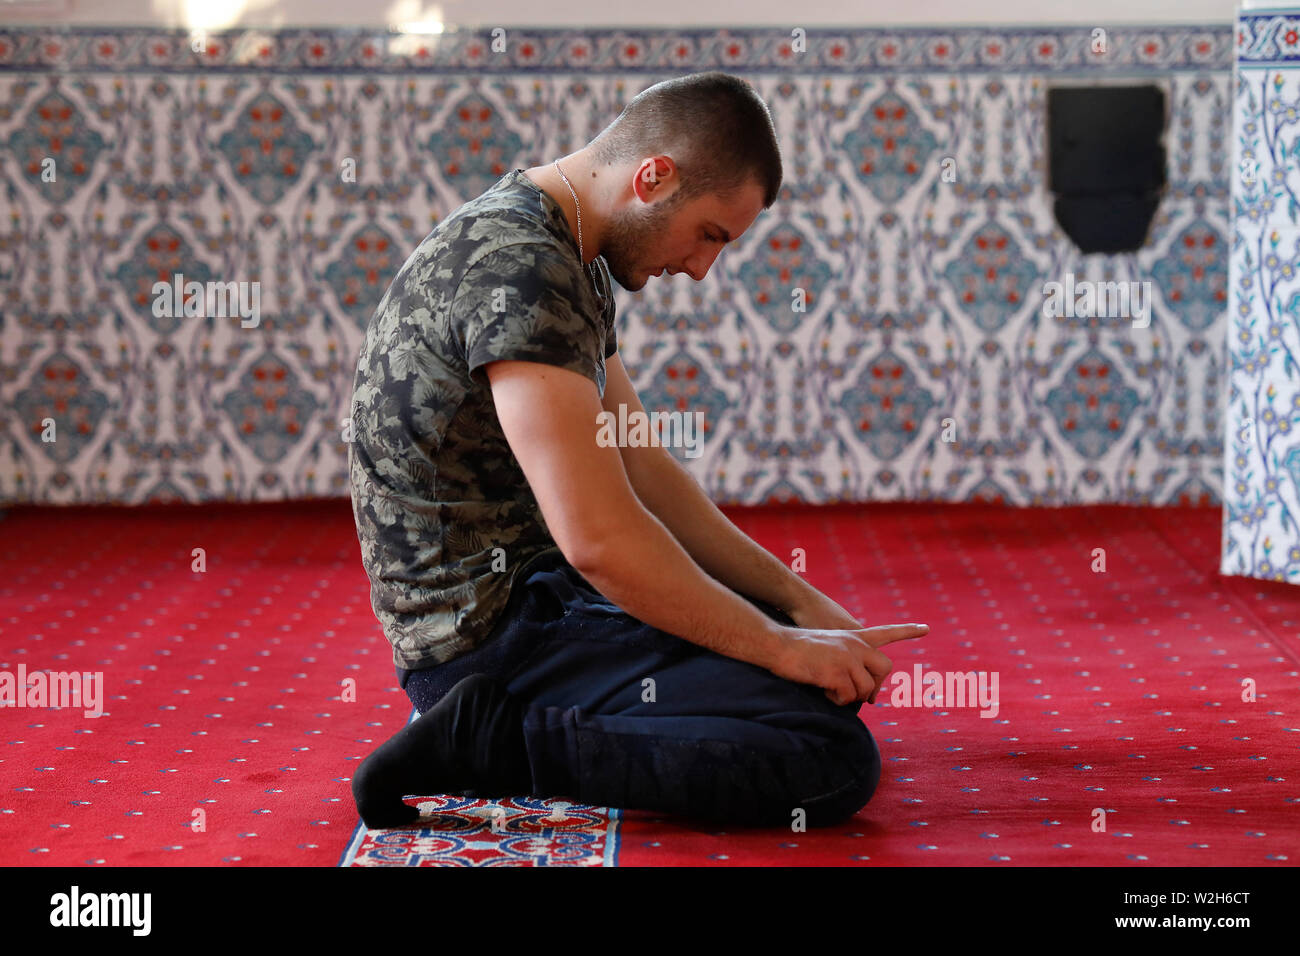 Young Kosovar praying in a Prizren mosque, Kosovo. Stock Photo